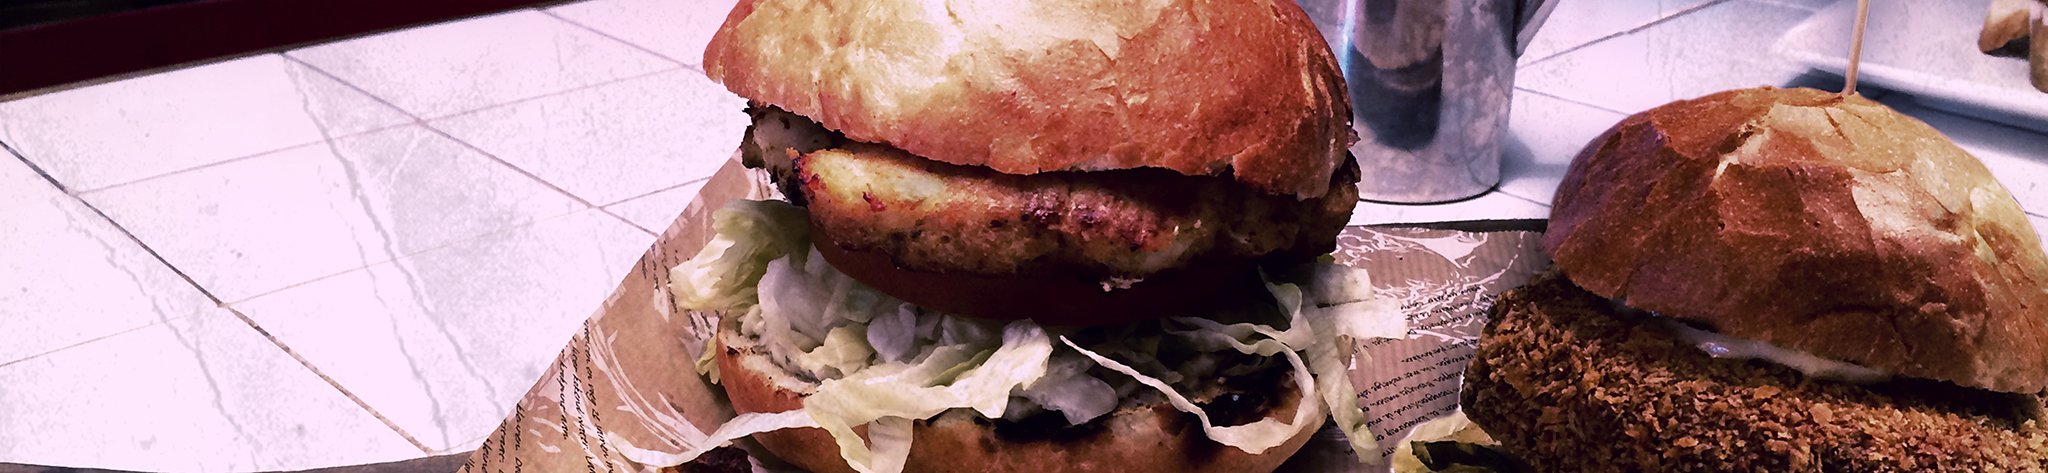 slider_burgerboot